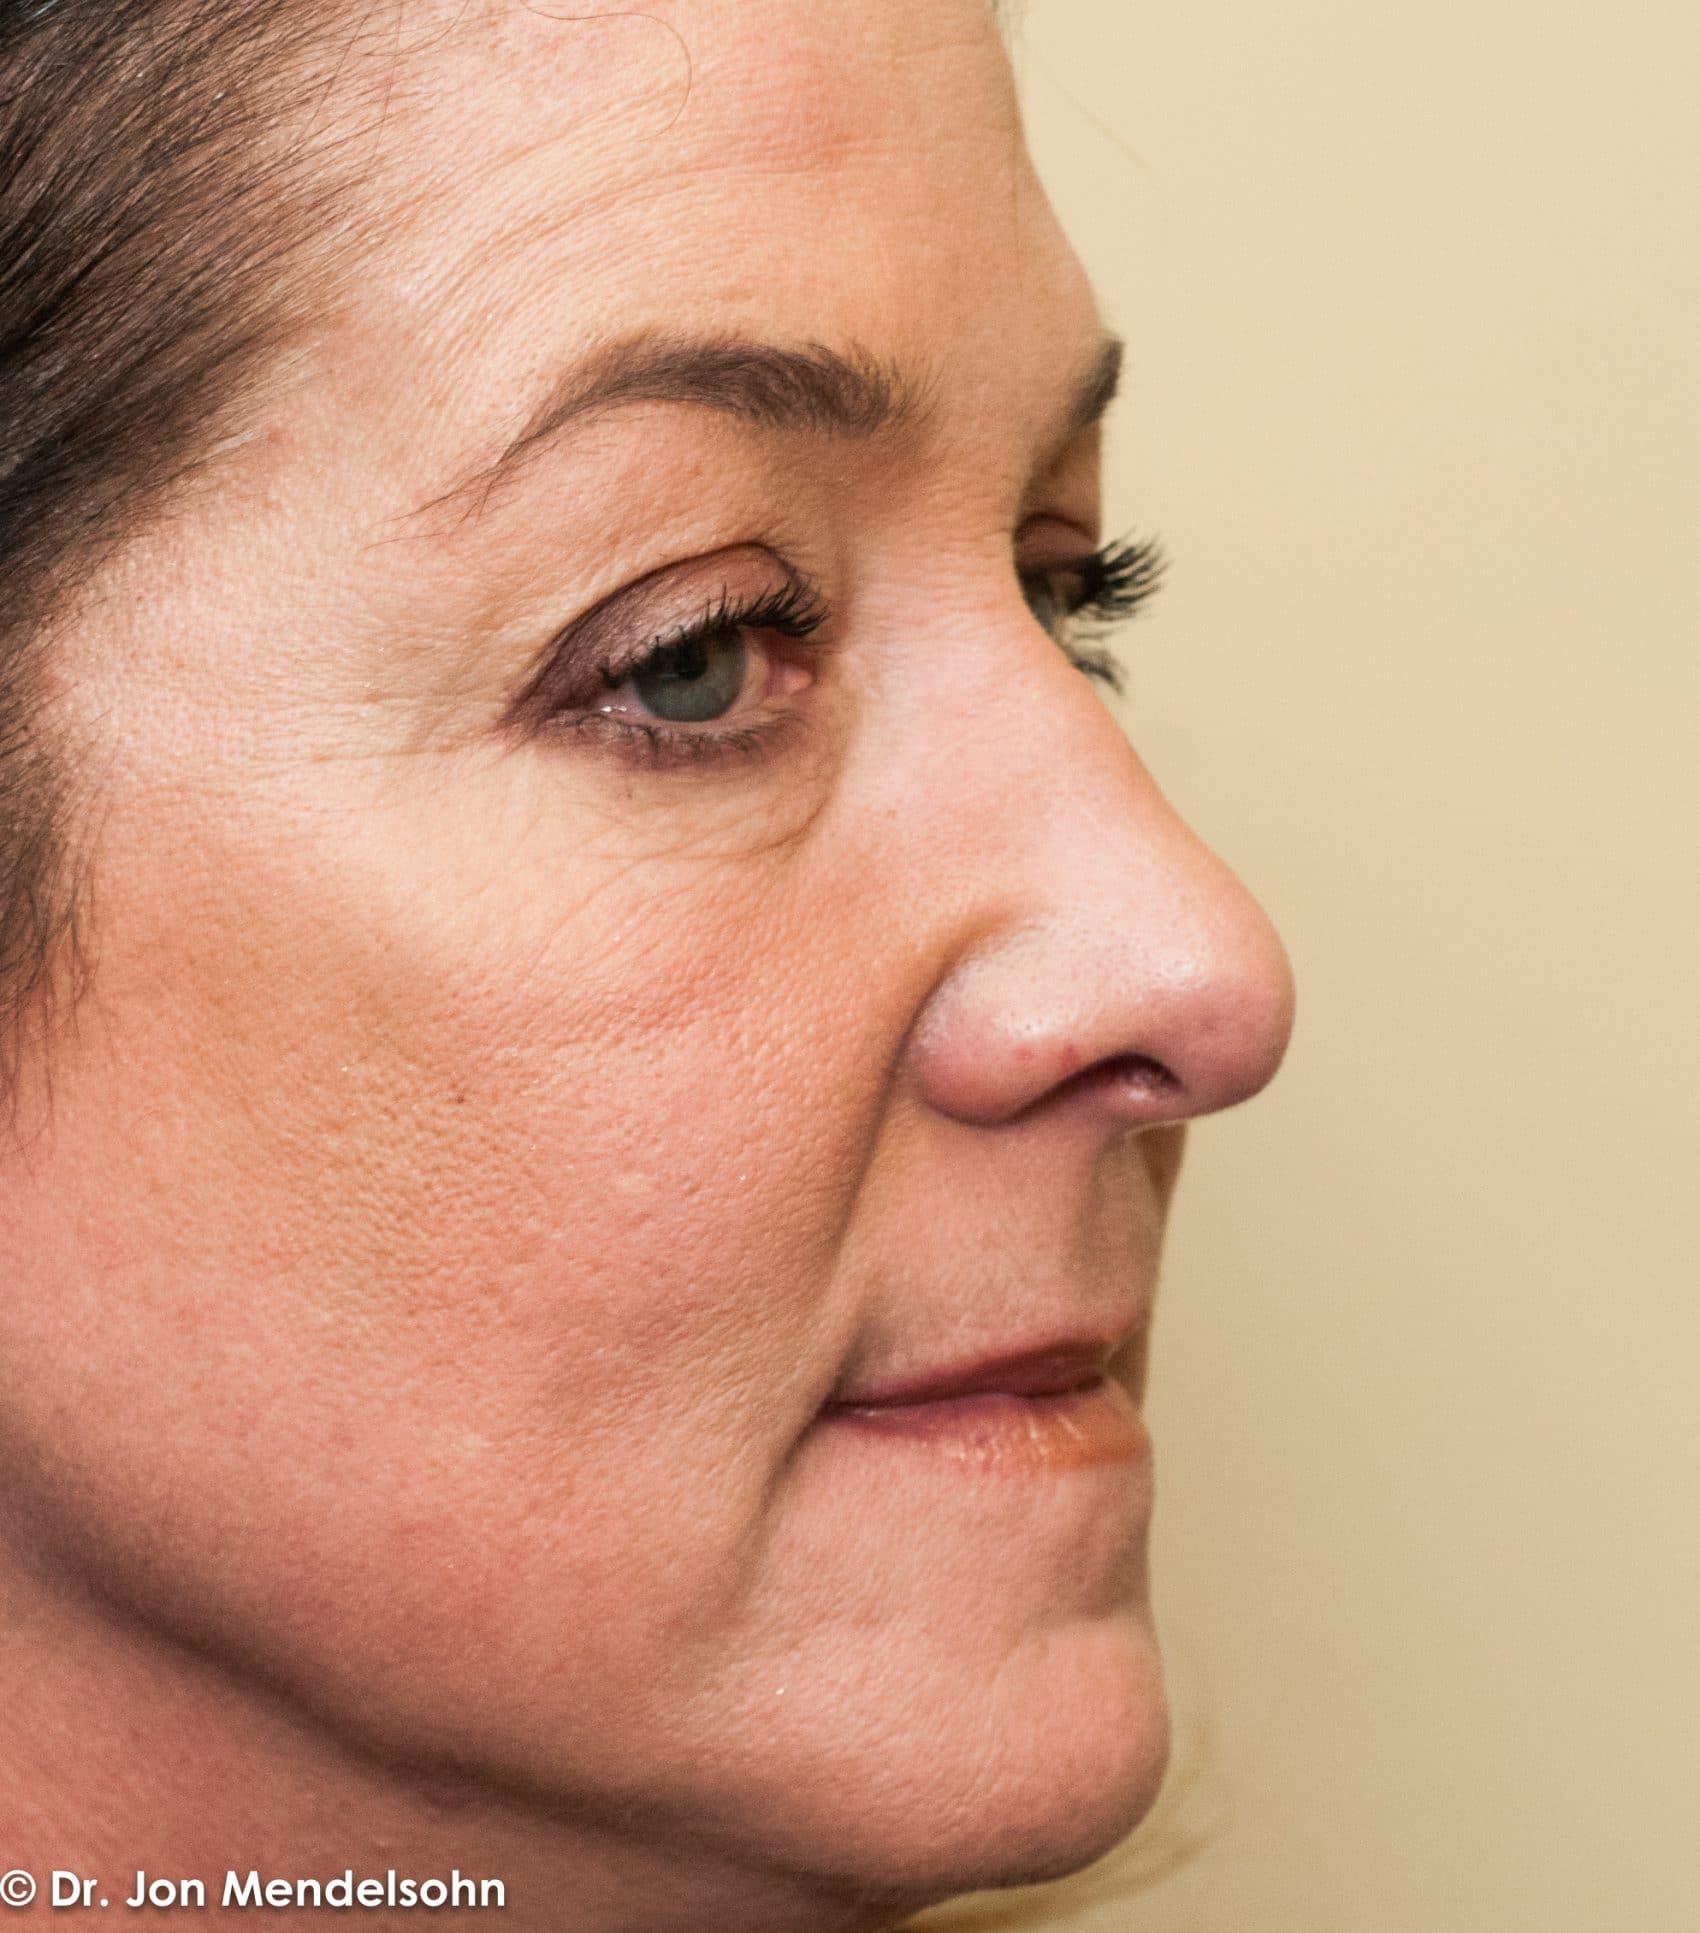 Upper-blepharoplasty-eyelid-surgery-cincinnati-dr-jon-mendelsohn-best-eyelid-surgery-plastic-surgery-realself-truseselfies-three-quarter-right-before-Cross_Angie-34826-2